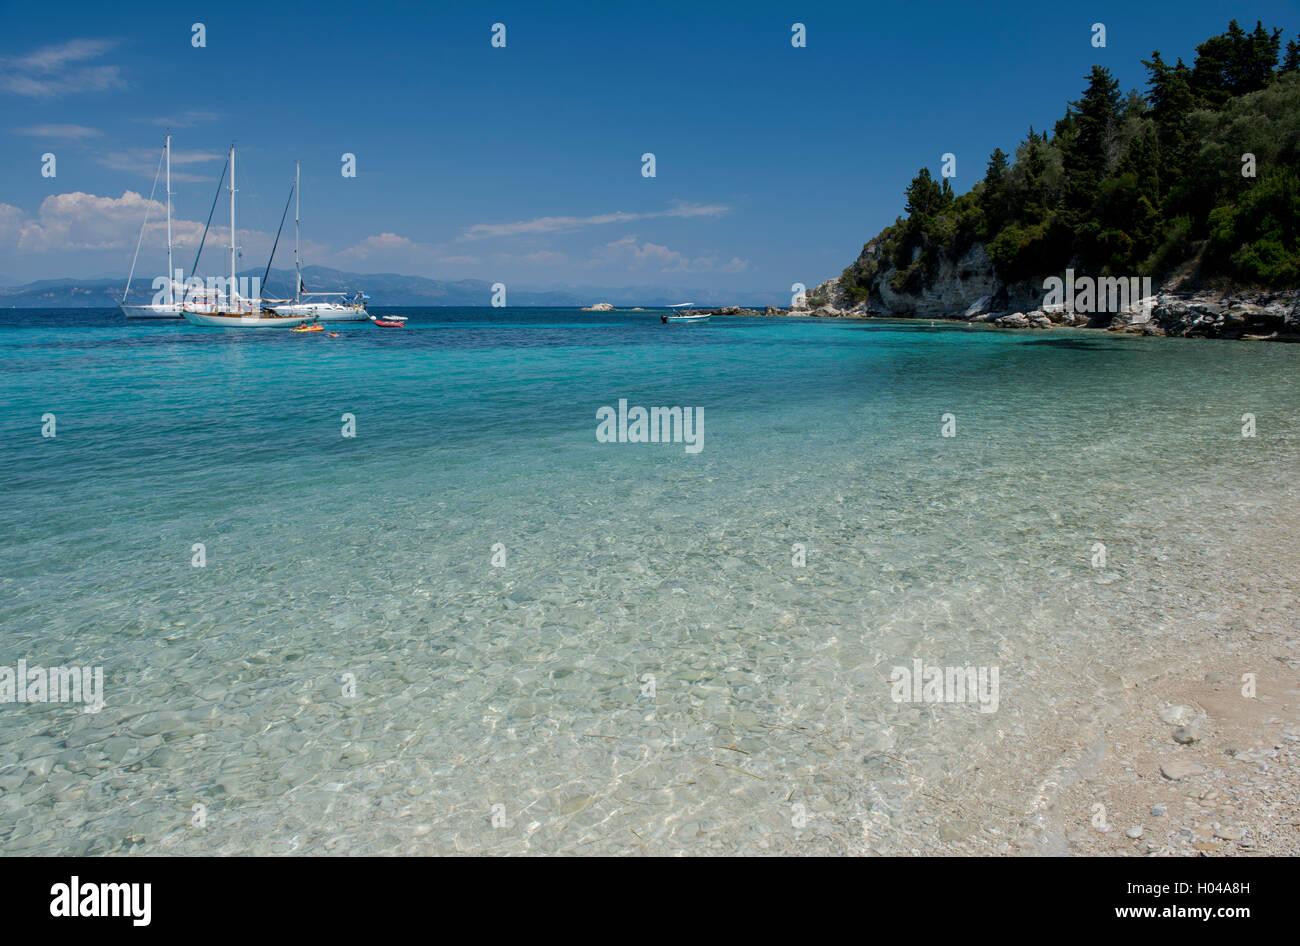 Sailing yachts off Marmari Beach on the east coast of Paxos, The Ionian Islands, The Greek Islands, Greece, Europe - Stock Image